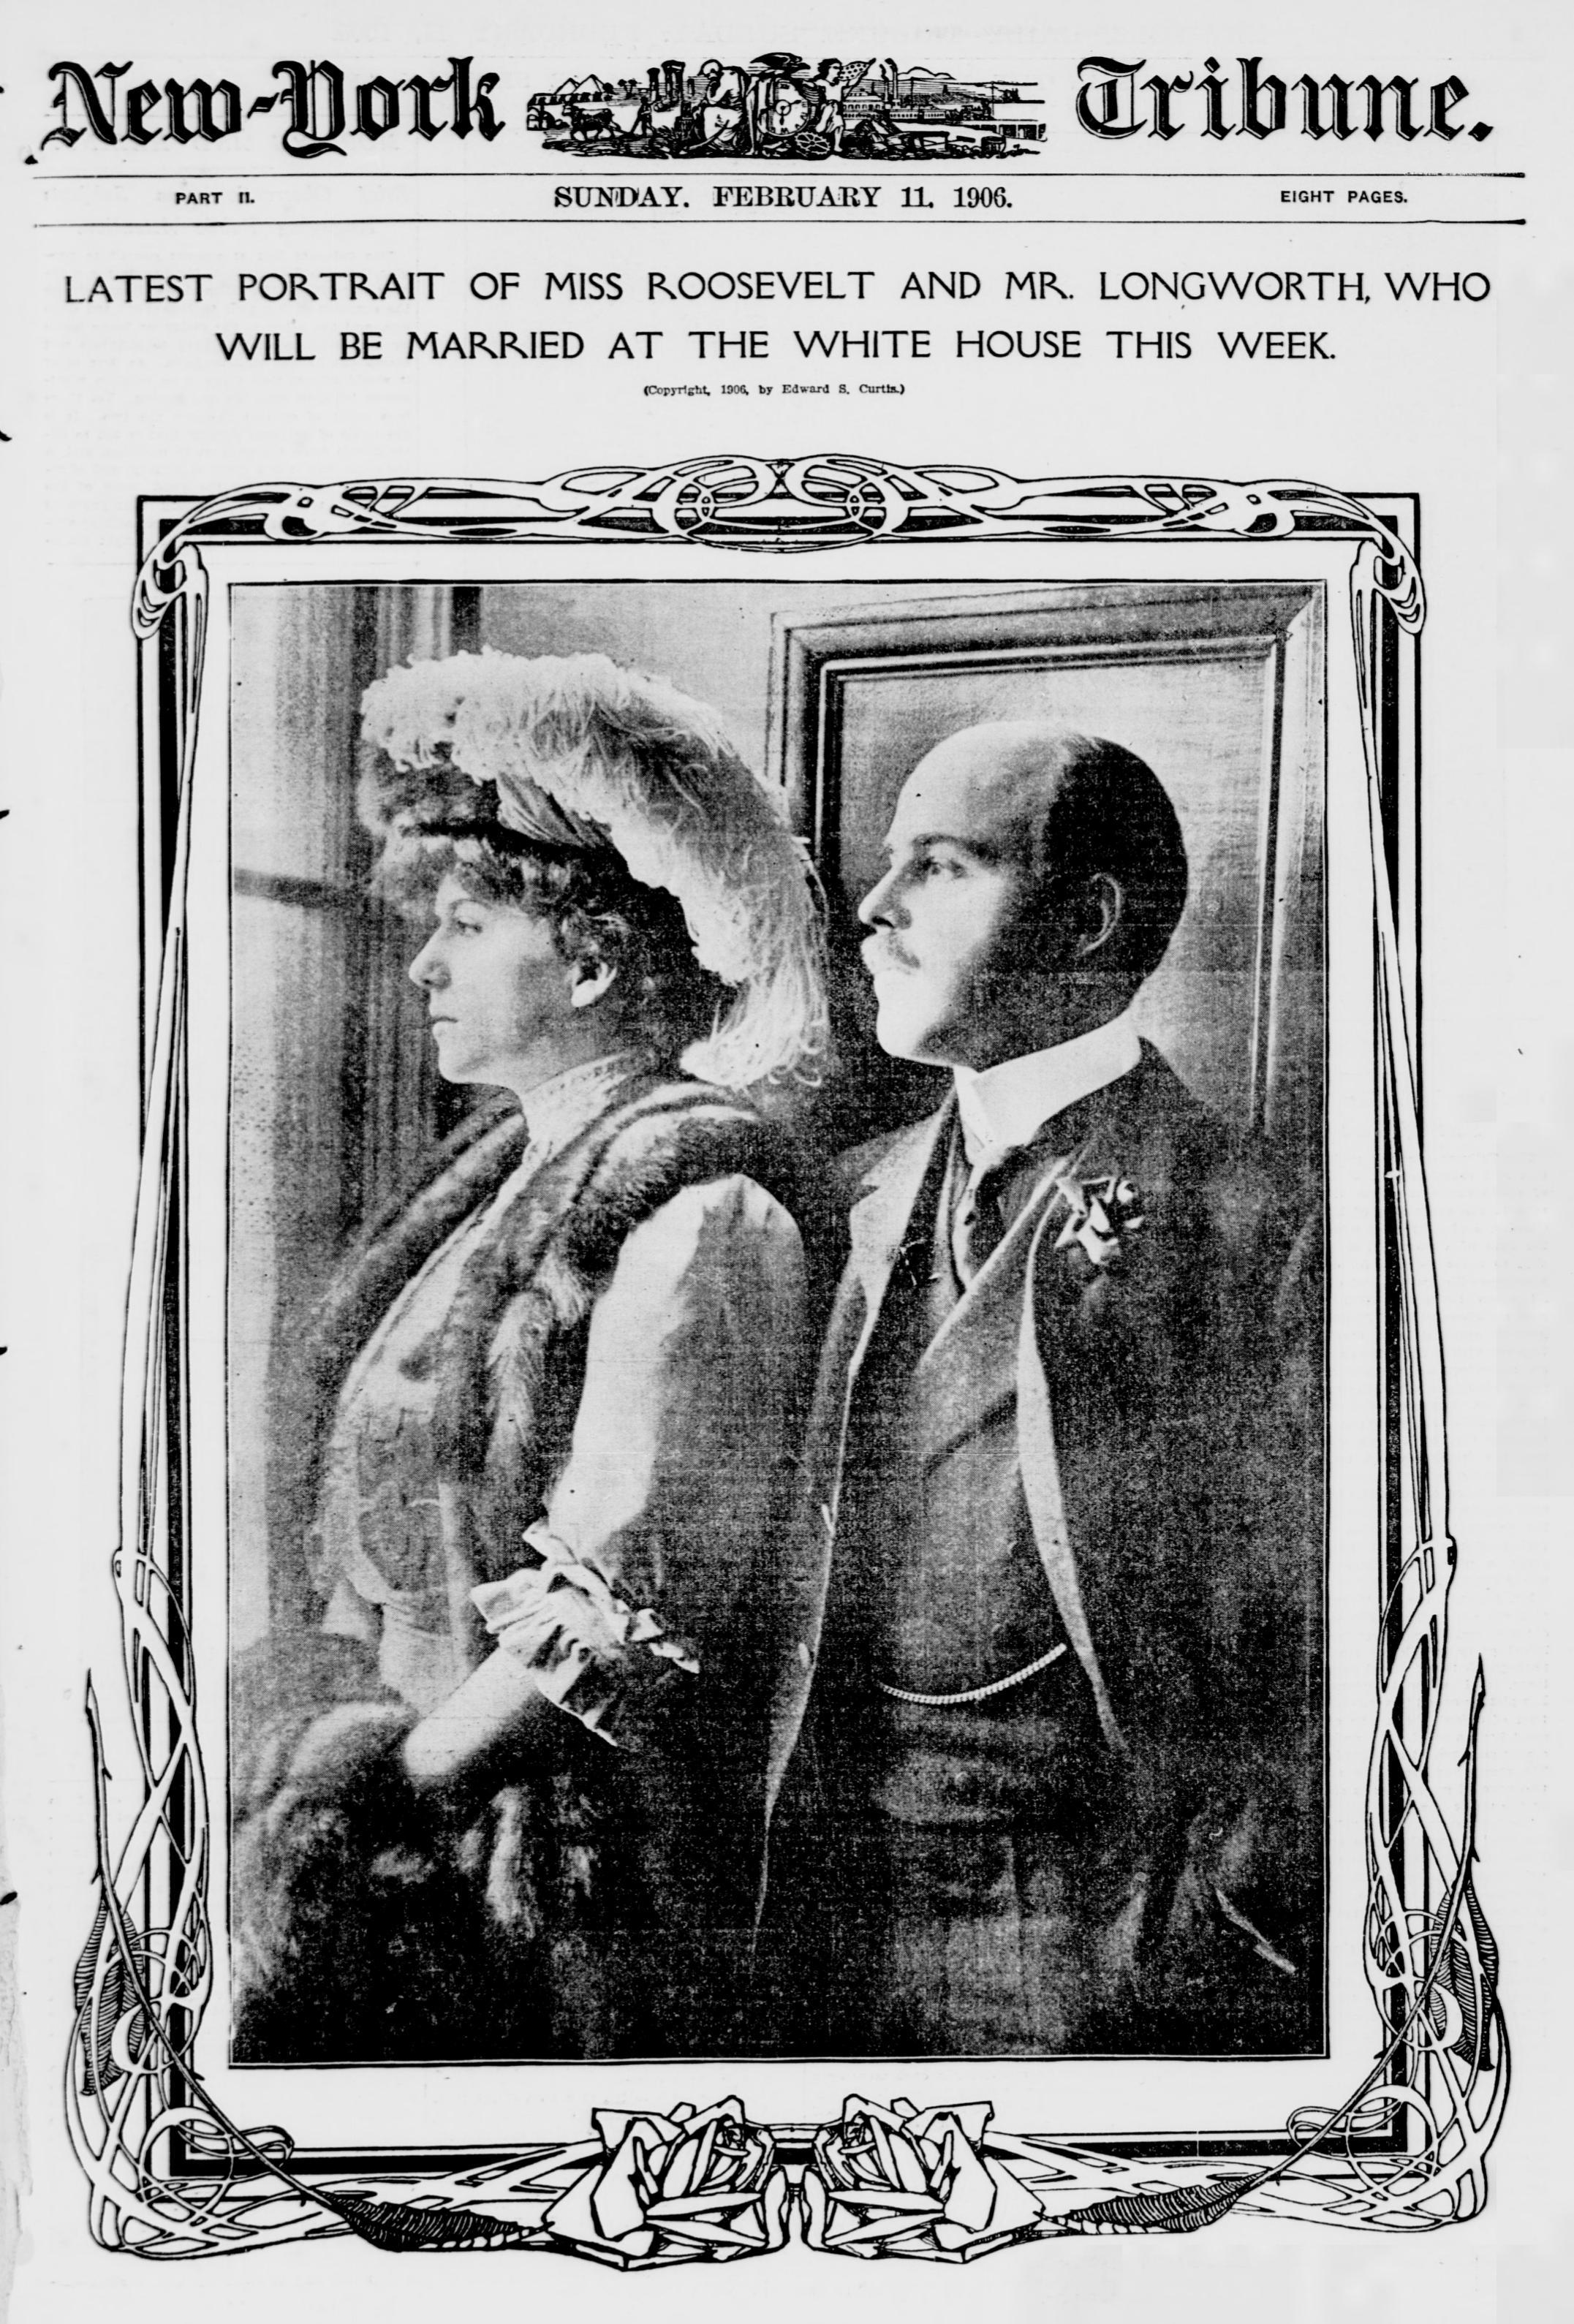 Alice Lee Roosevelt andNicholas Longworth